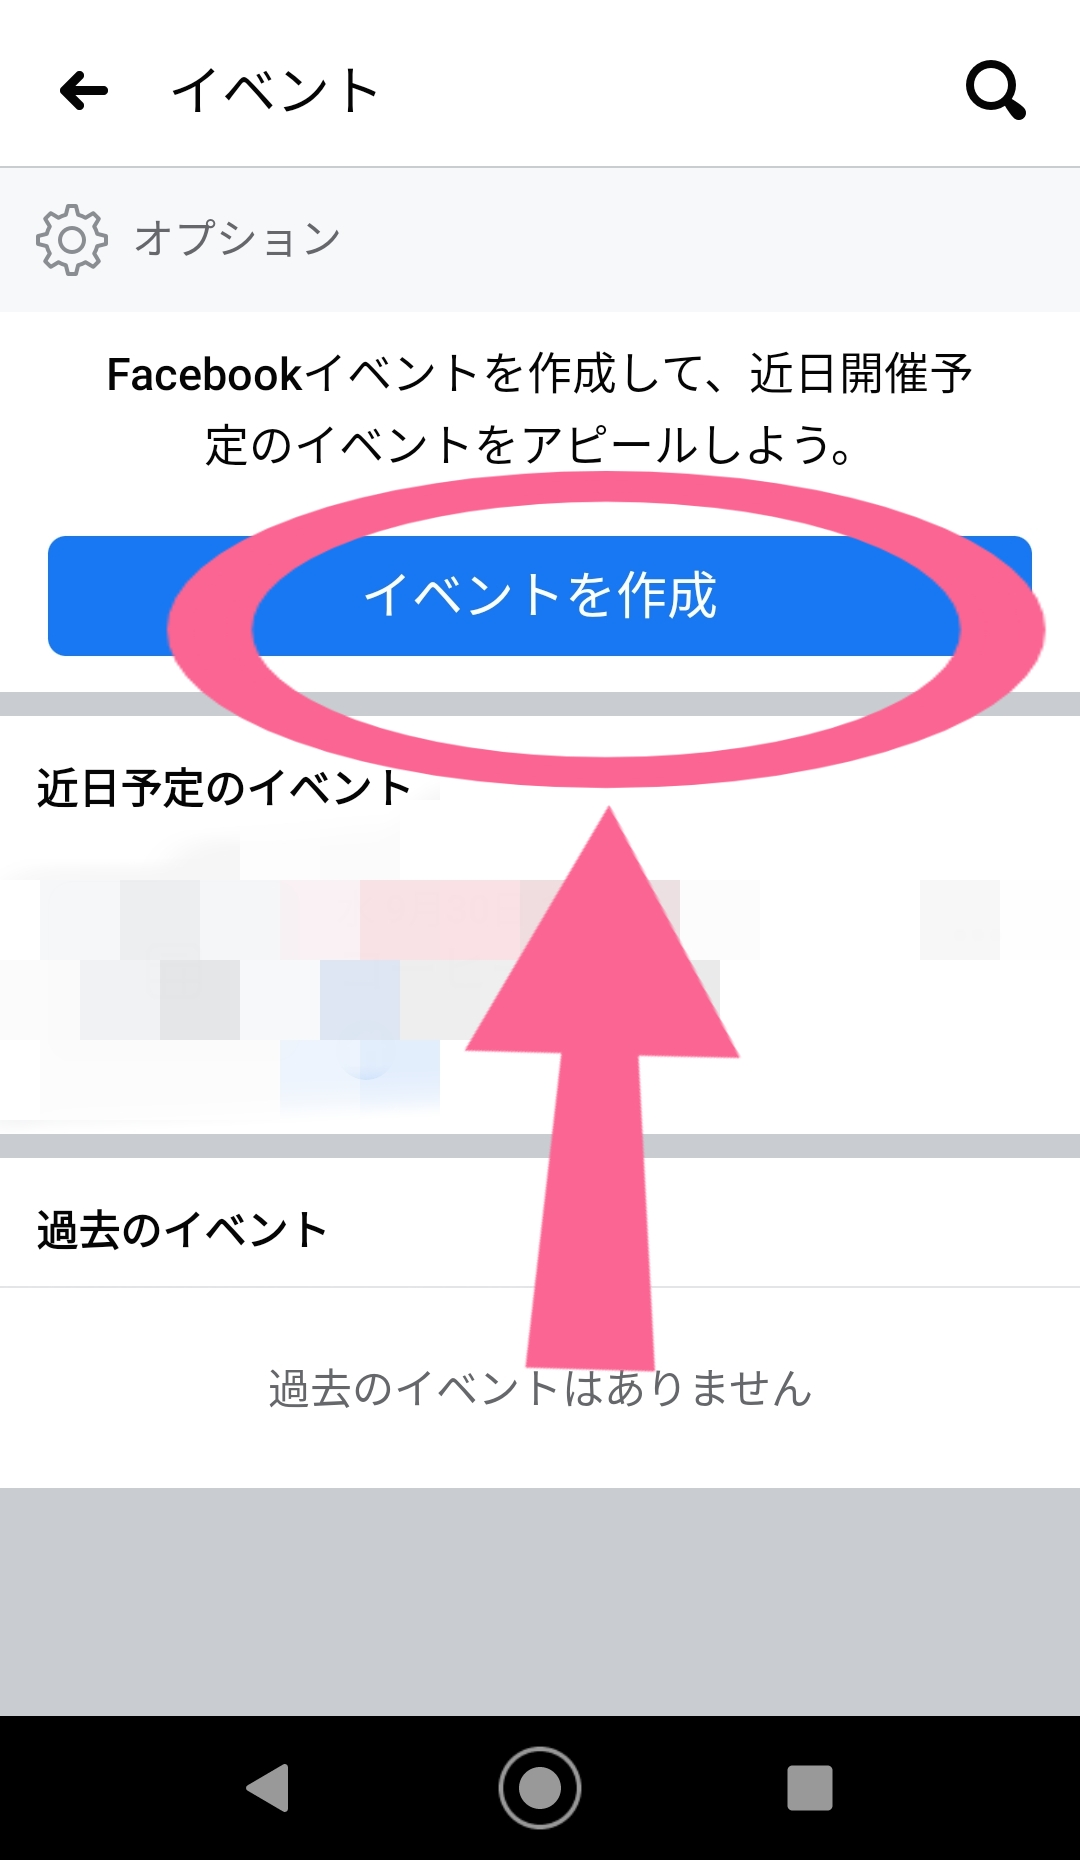 Facebookページ イベントを作成 タップ